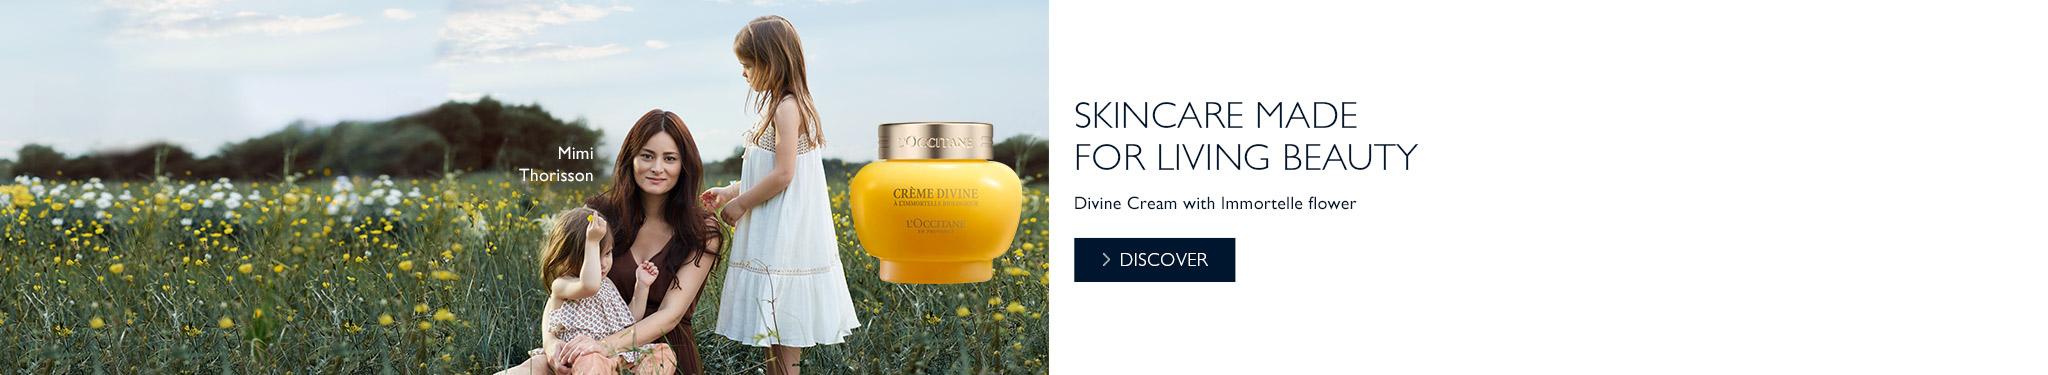 Skin Made For Living Beauty